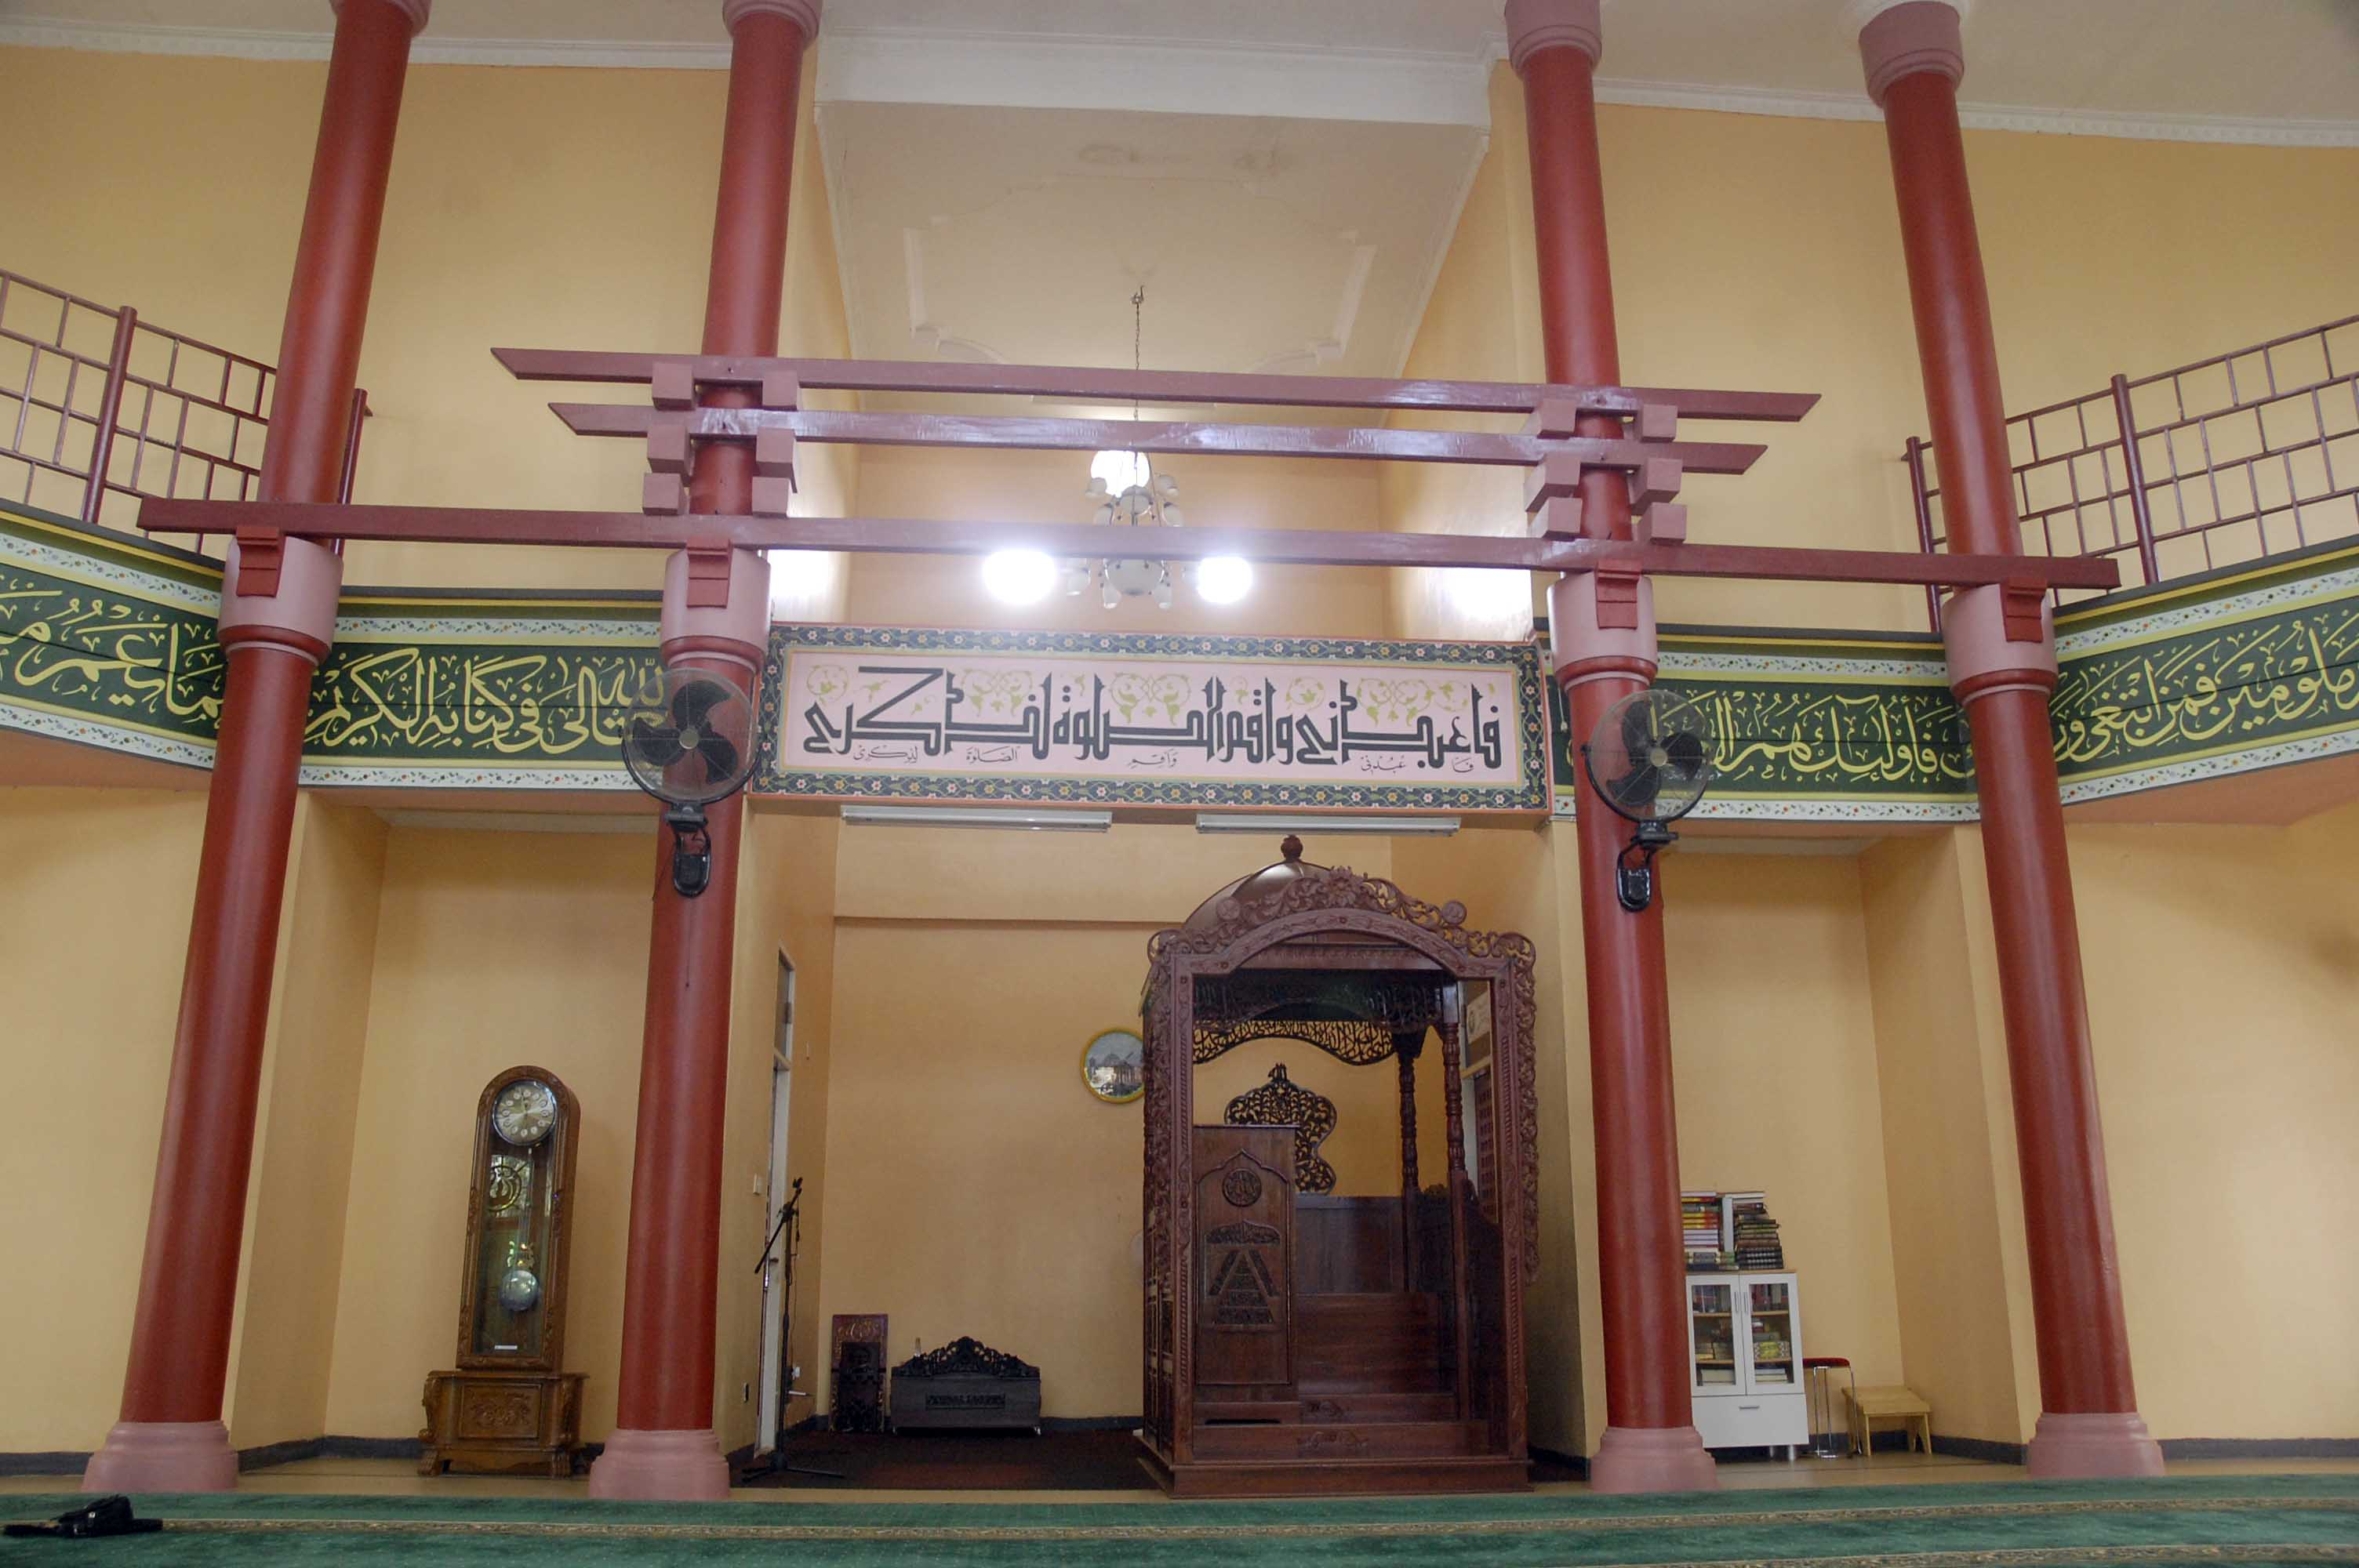 Masjid Cheng Ho Simbol Keragaman Kota Palembang Kontras Suhu Terik